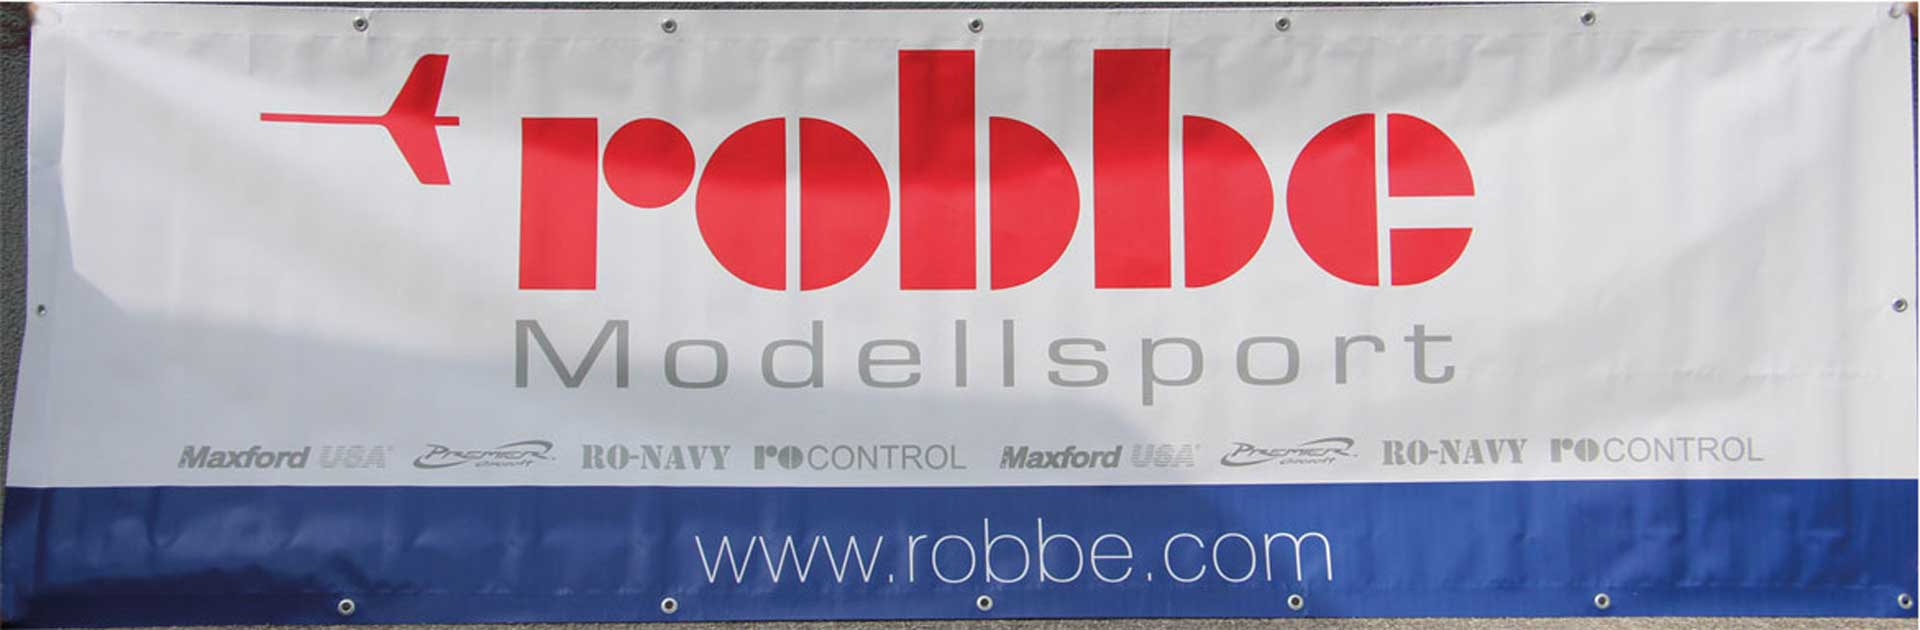 TRANSPARENT ROBBE MODEL SPORT 1X3M RENTAL ARTICLE